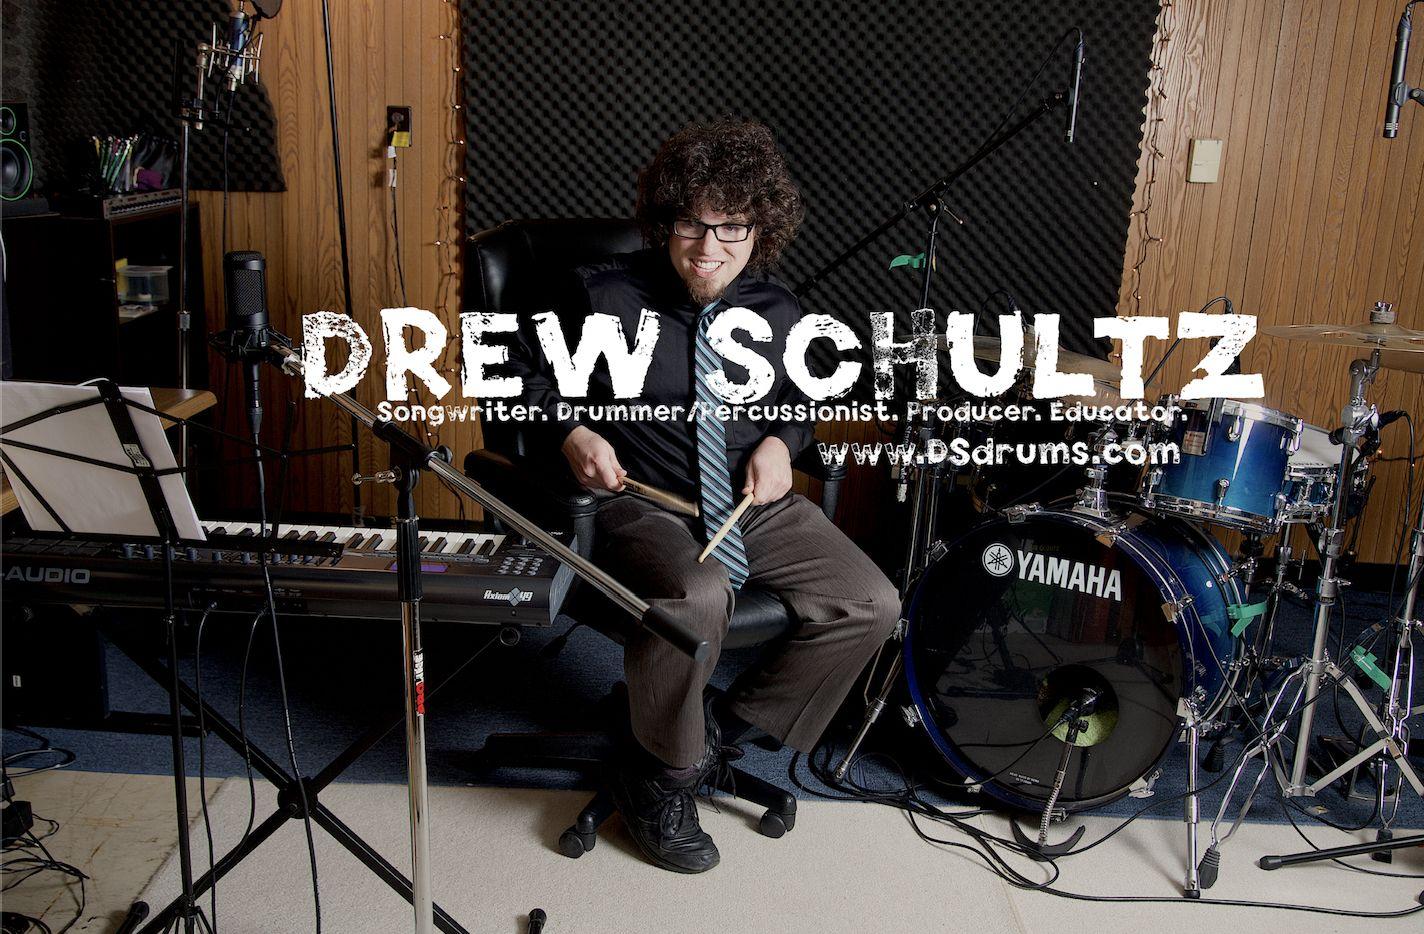 Drew Schultz - Drummer, Percussionist, Songwriter, Producer, Educator